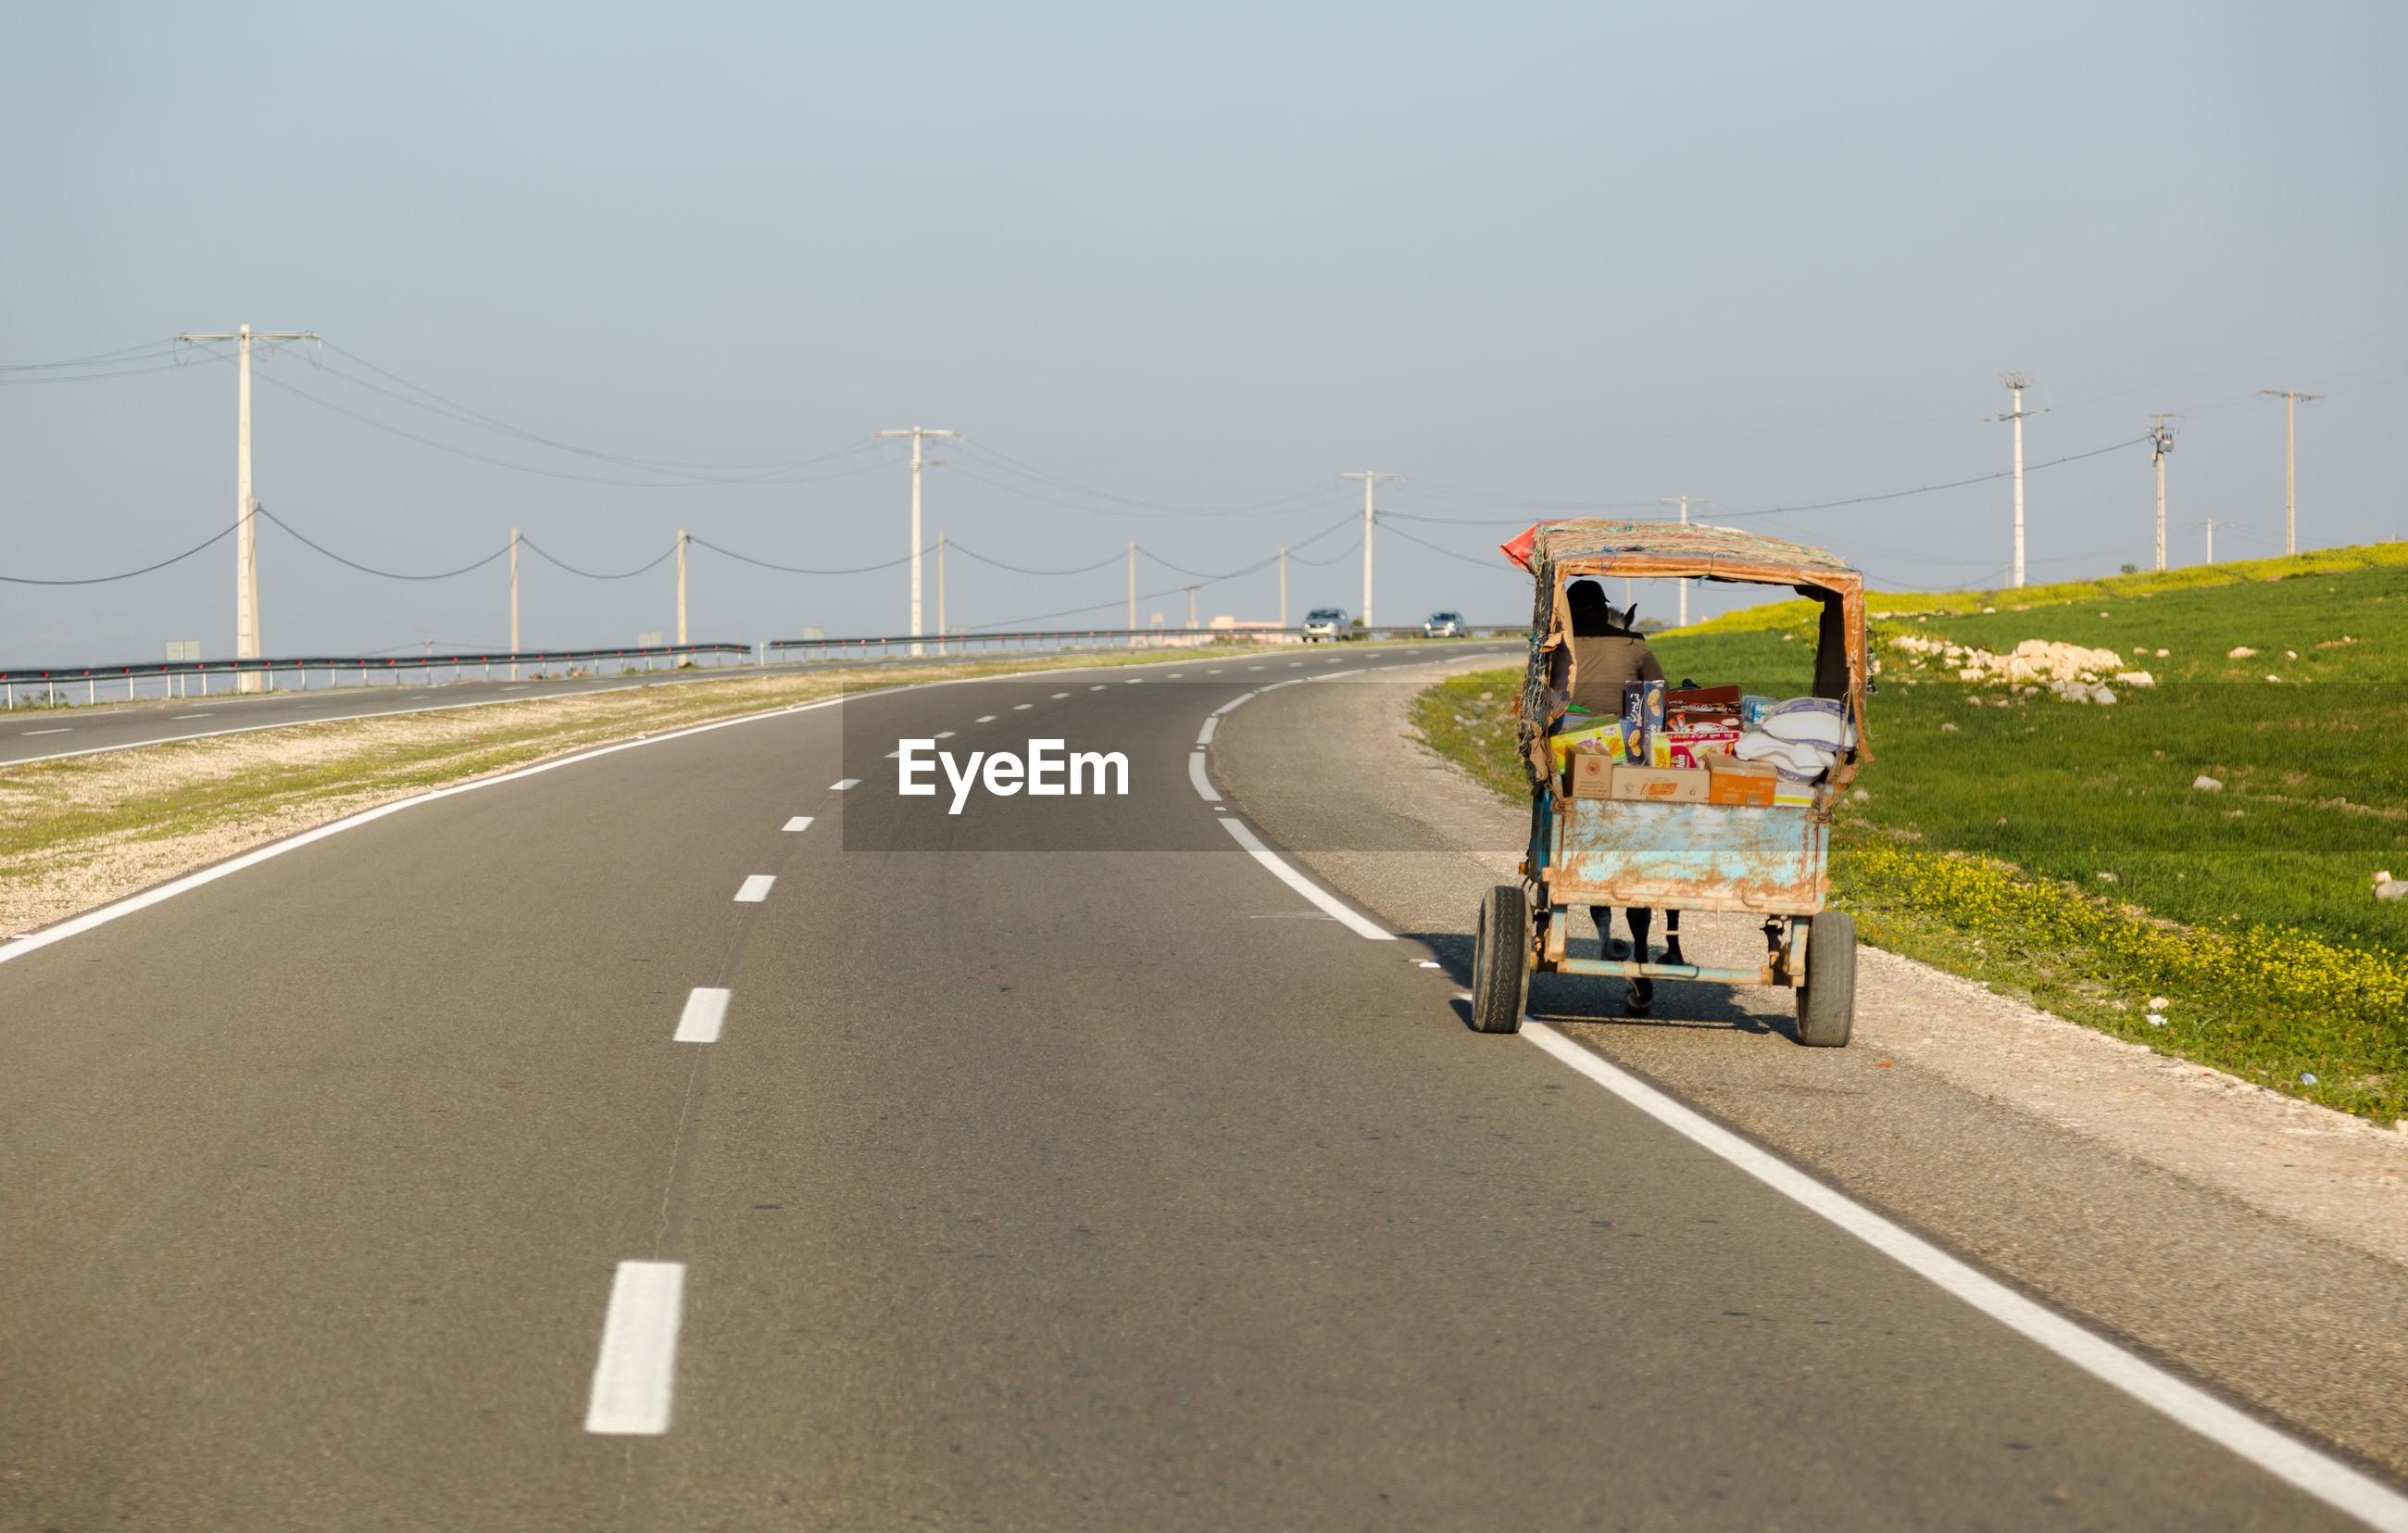 PEOPLE RIDING MOTORCYCLE ON ROAD BY BRIDGE AGAINST SKY